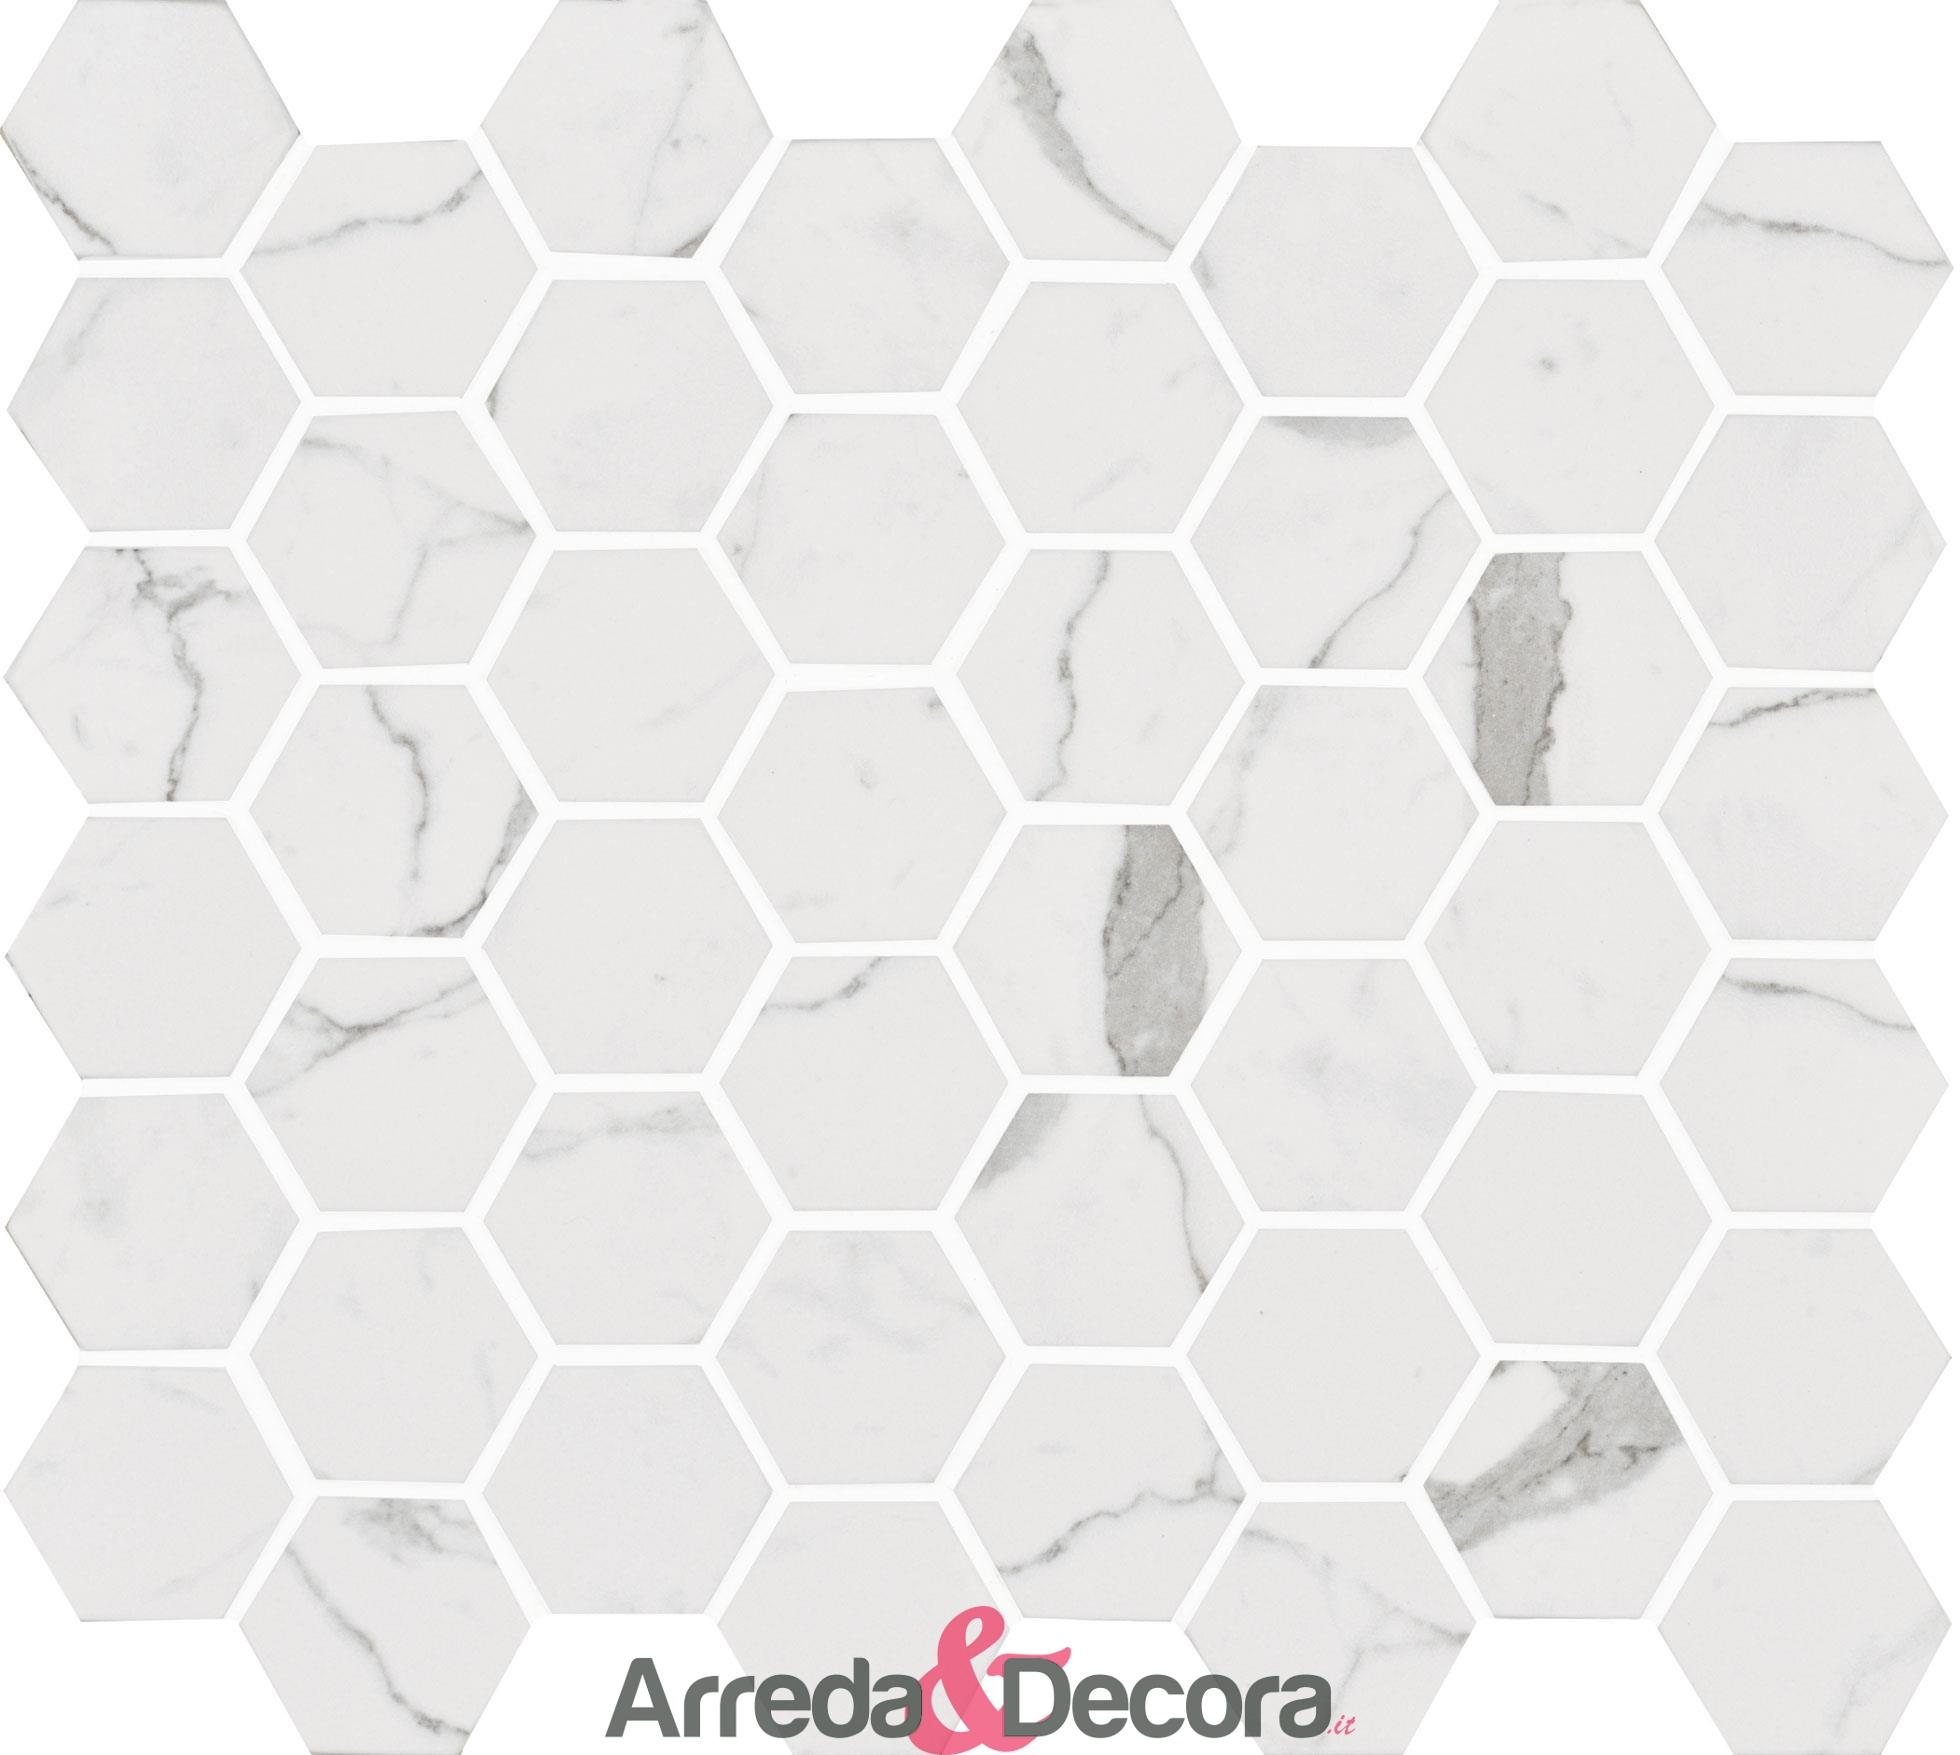 mosaico-esagonale-in-vetro-riciclato-bianco